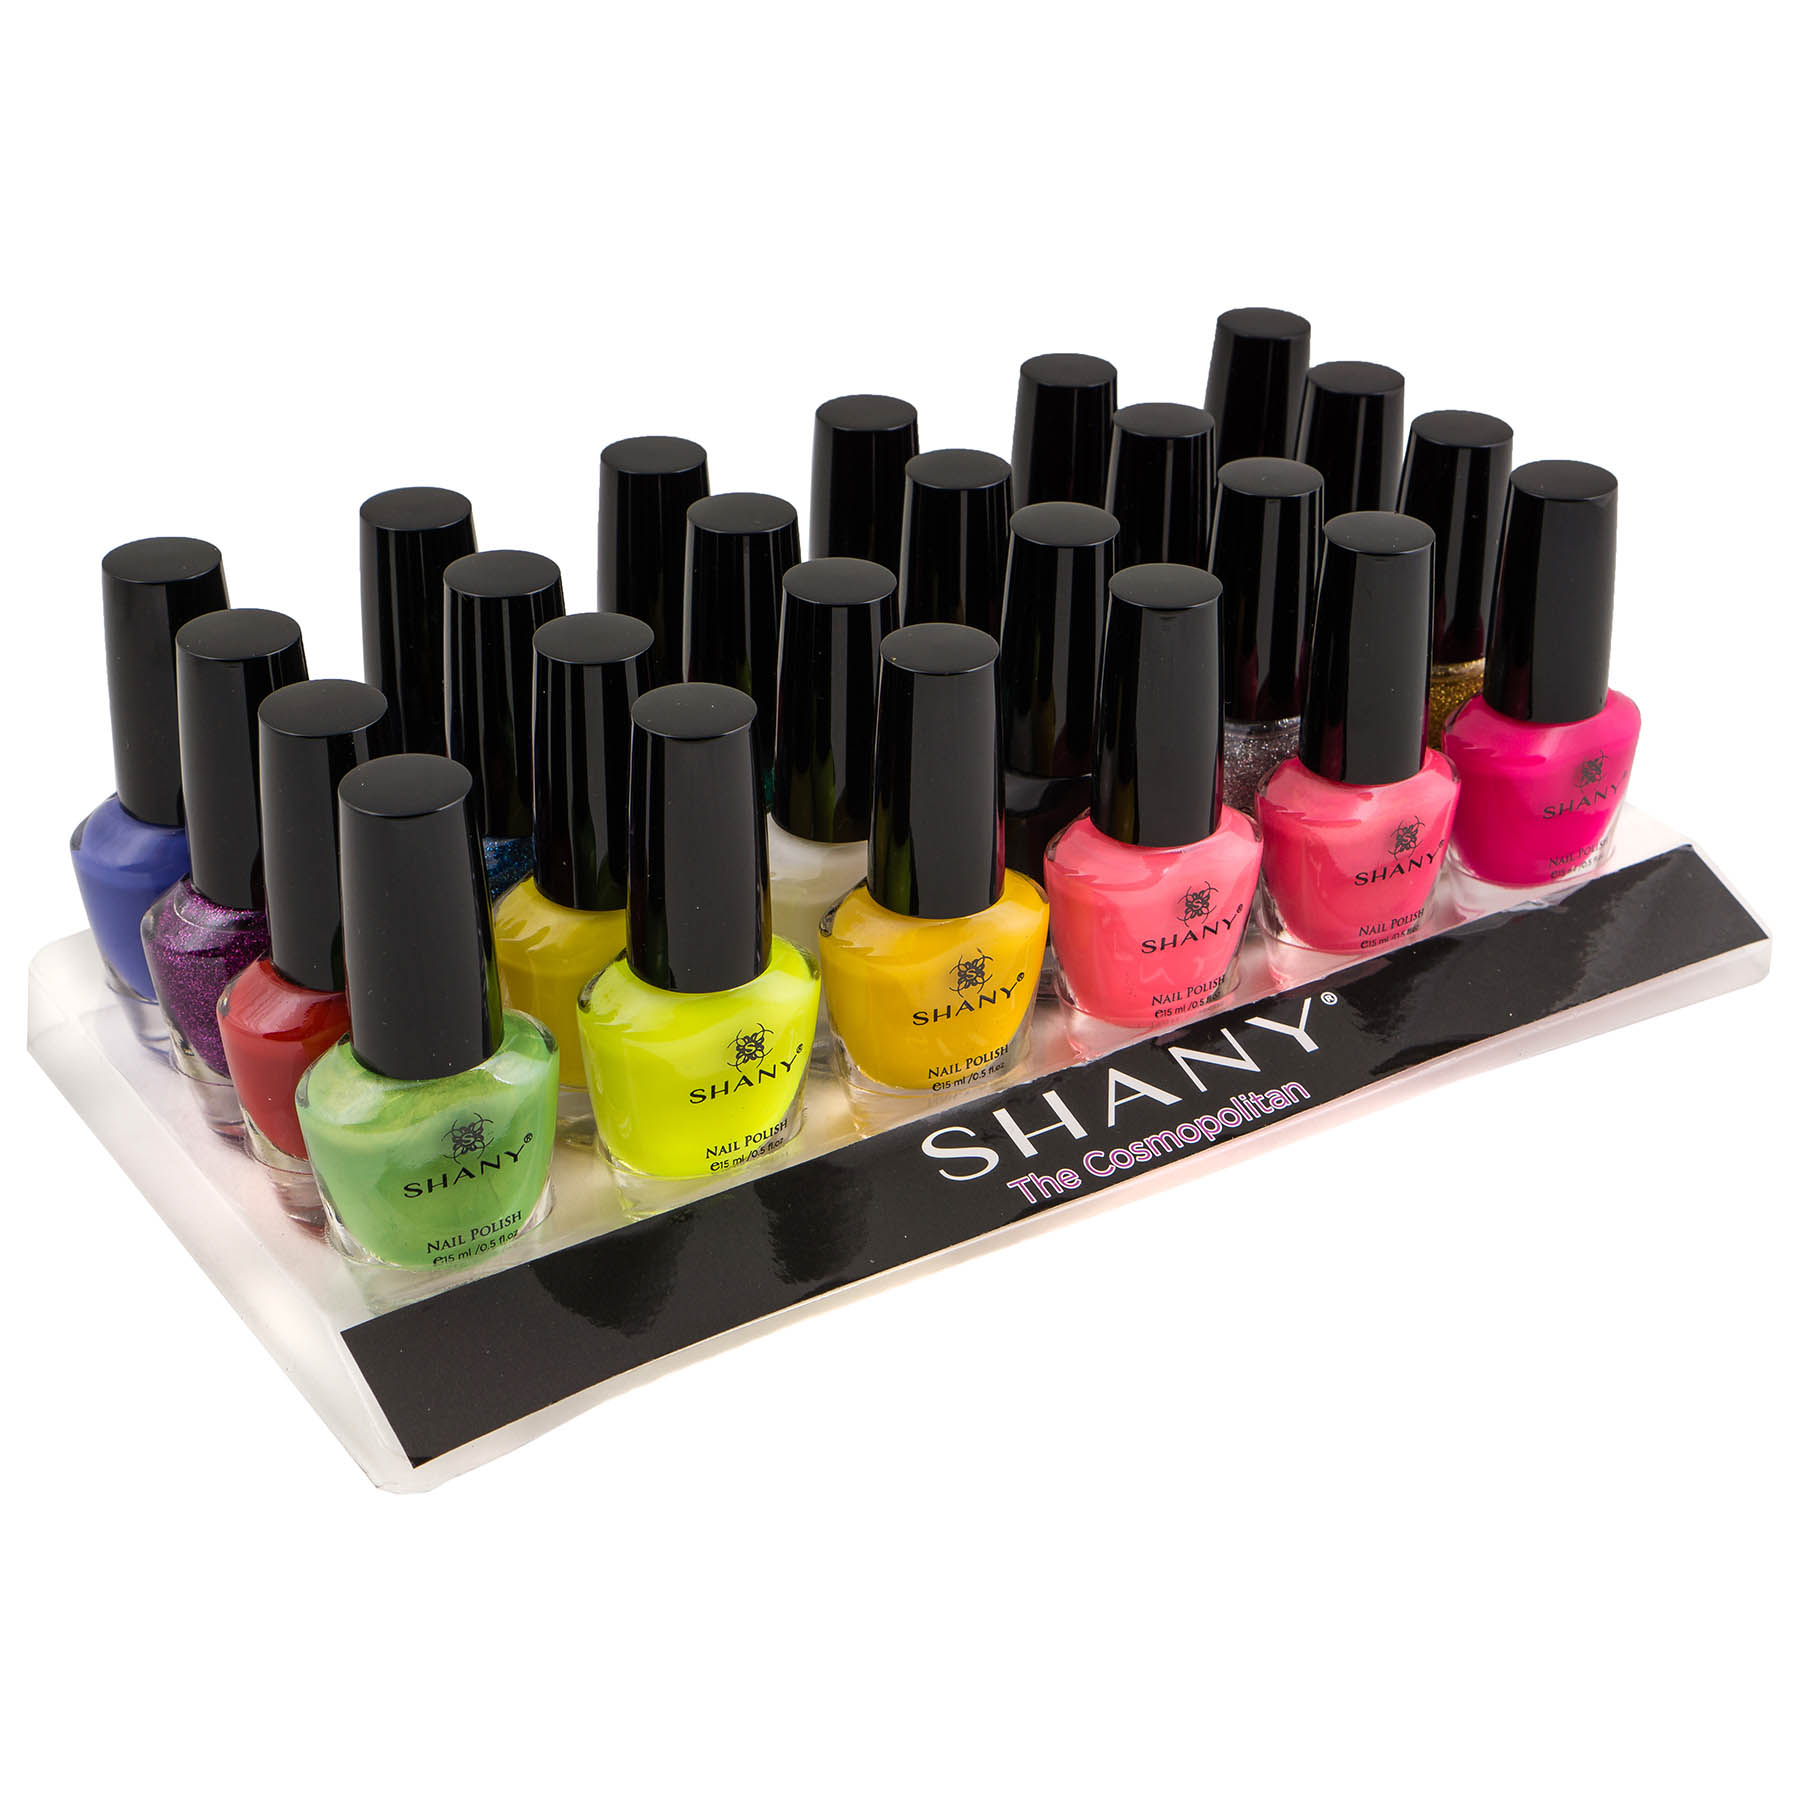 SHANY Cosmopolitan Nail Polish Set - Walmart.com